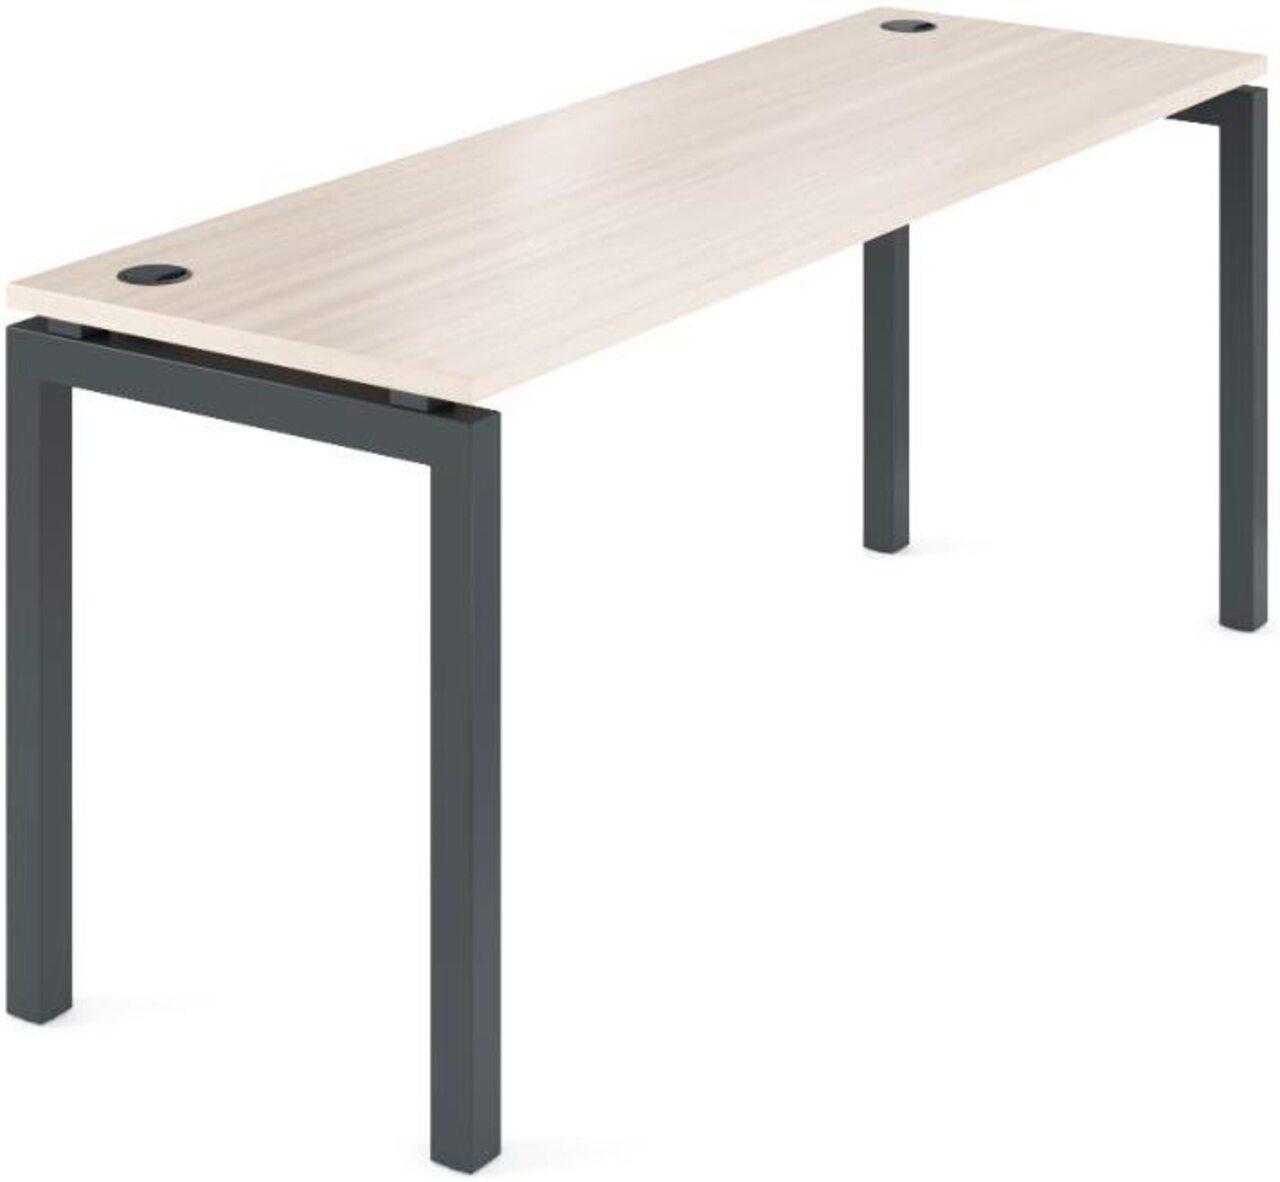 Стол на металлокаркасе  Арго 180x60x76 - фото 6